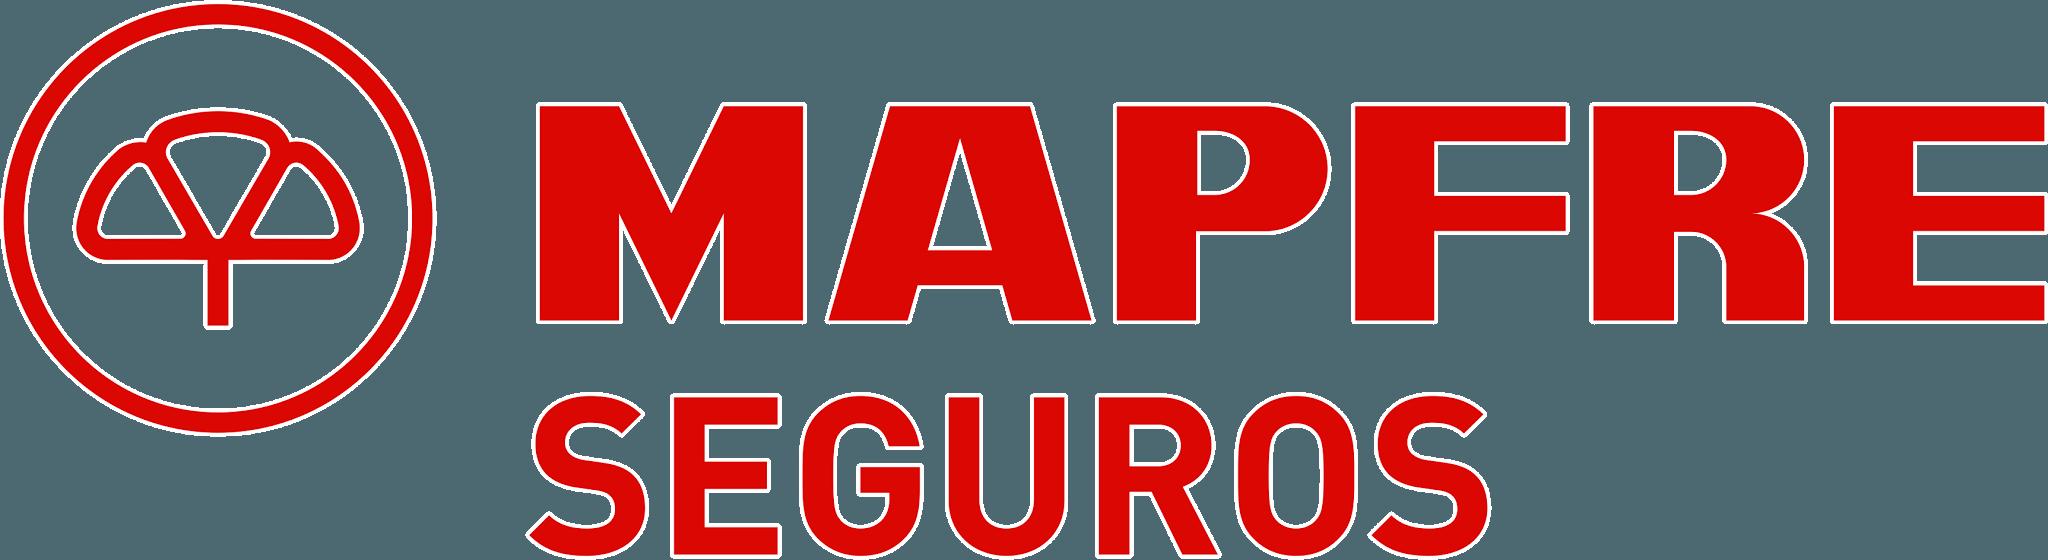 https://jurosbaixos.com.br/conteudo/wp-content/uploads/sites/2/2017/09/1505930822_image2.png